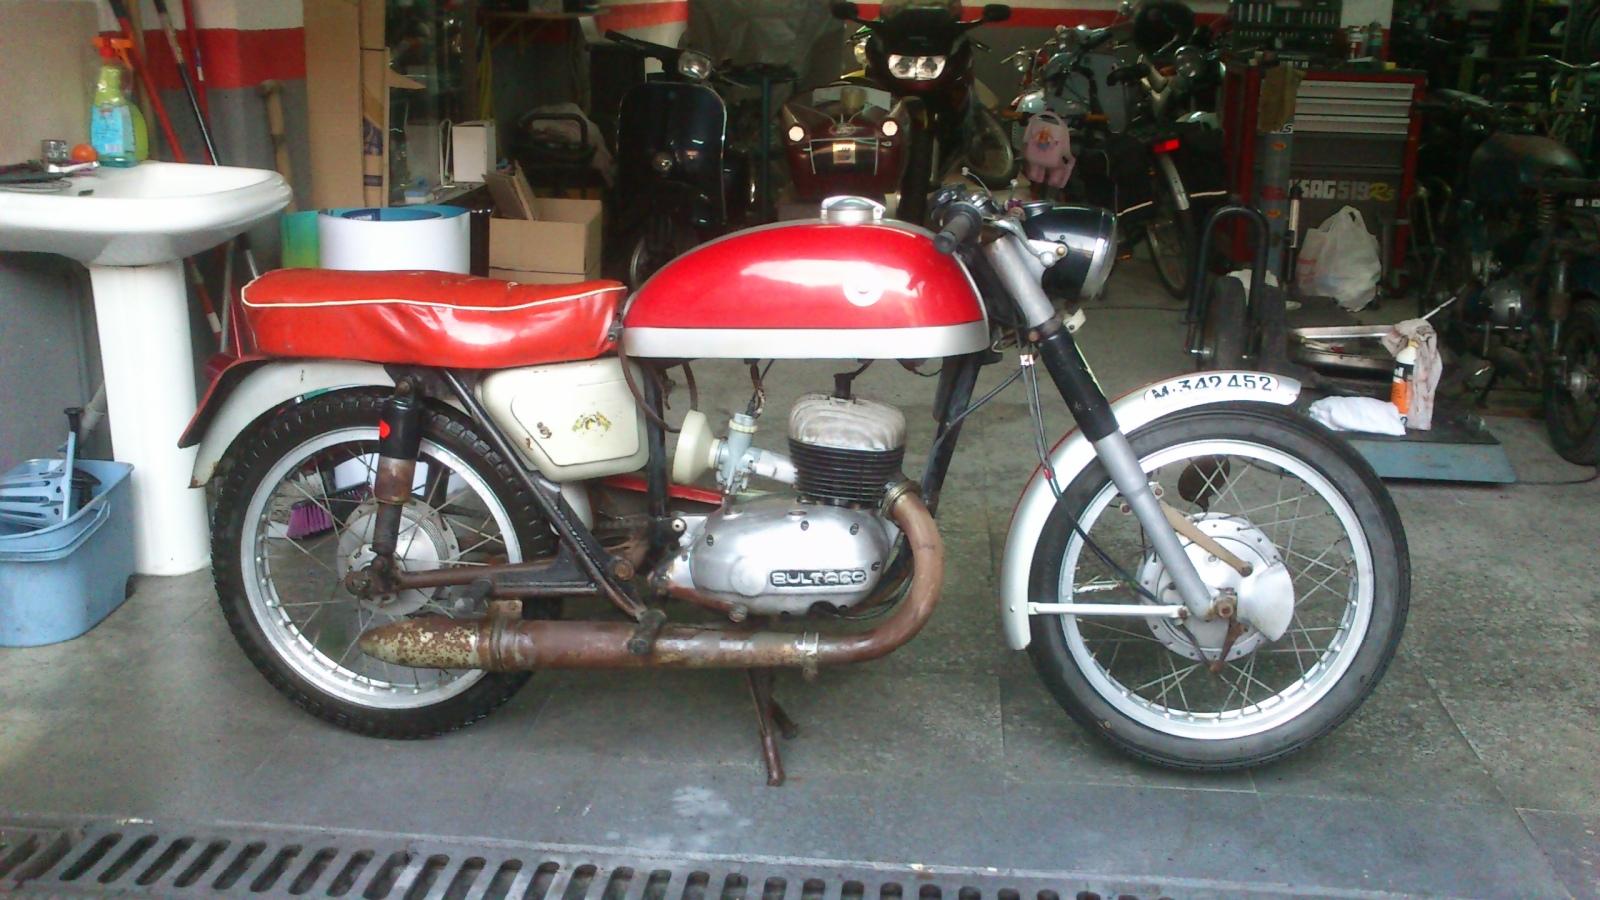 De vuelta a la carretera: Bultaco Tralla 102 71iw42